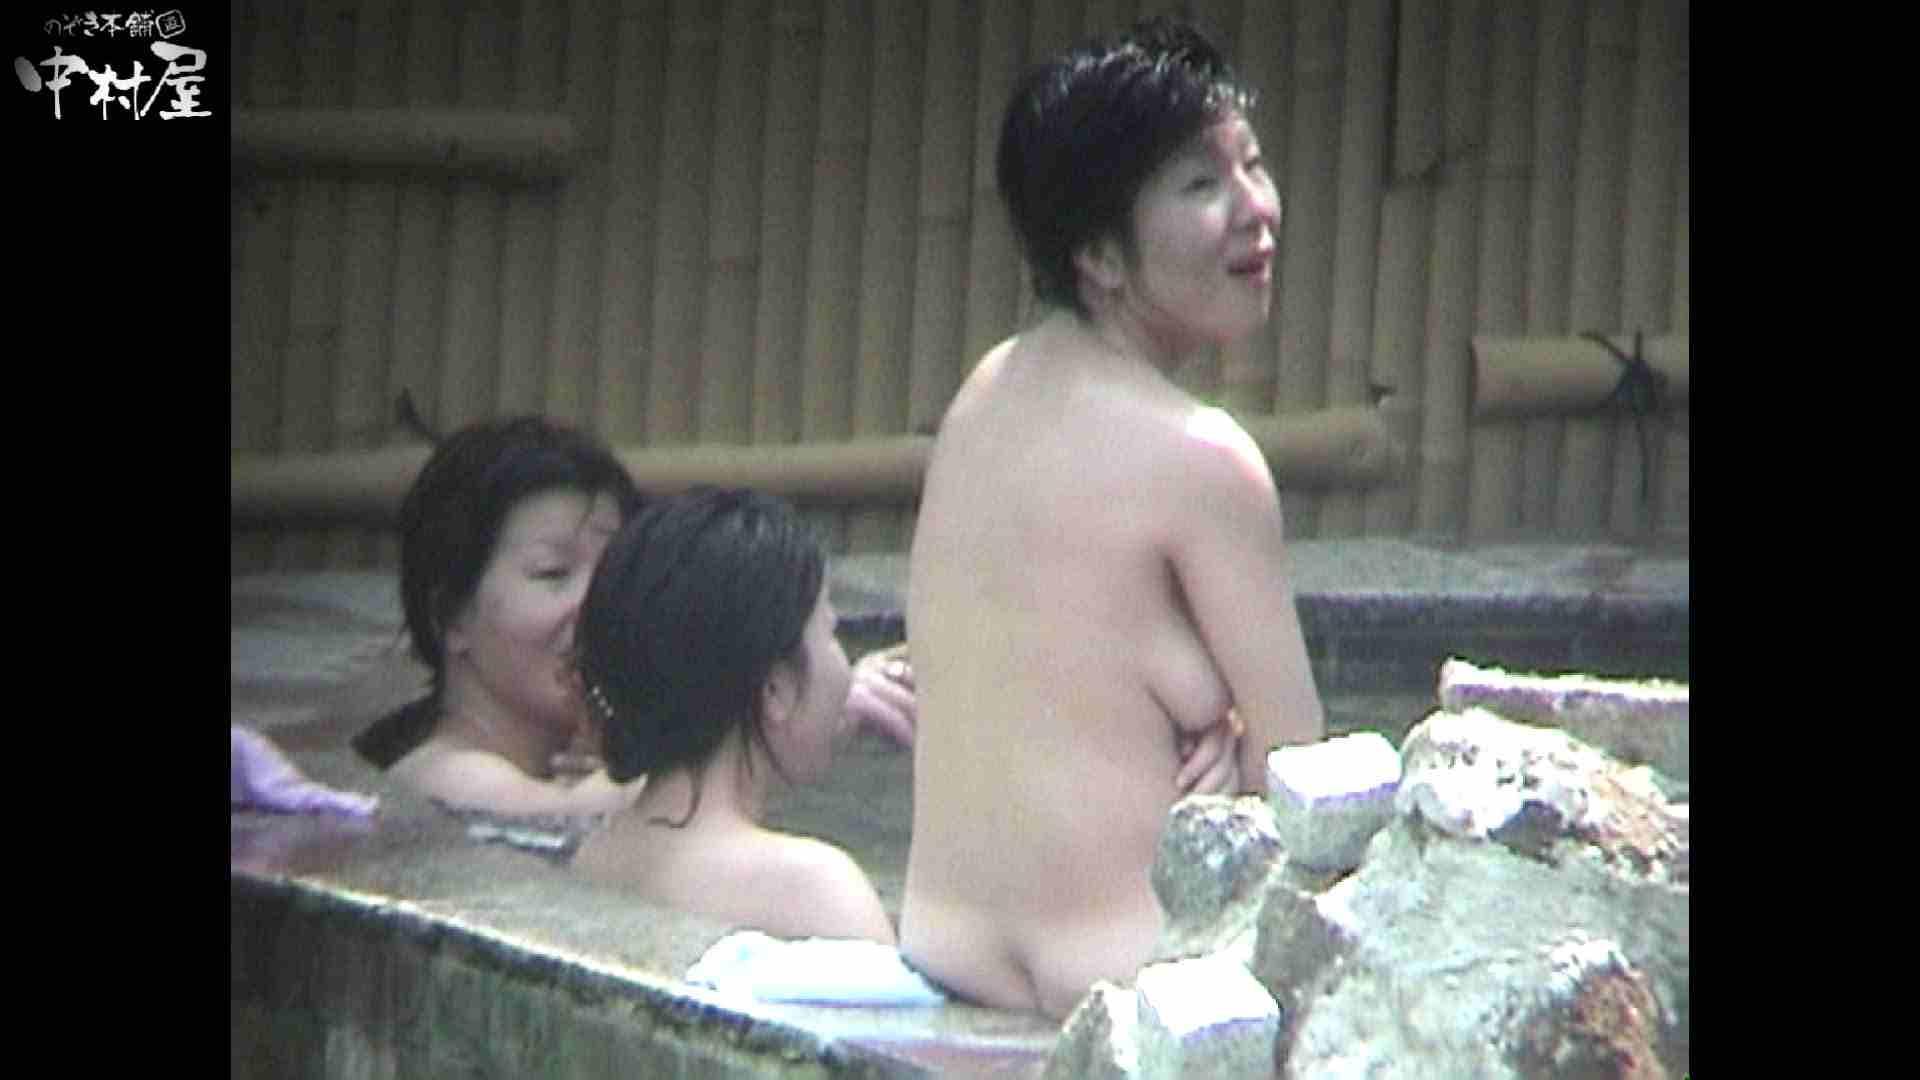 Aquaな露天風呂Vol.936 盗撮映像  110Pix 85